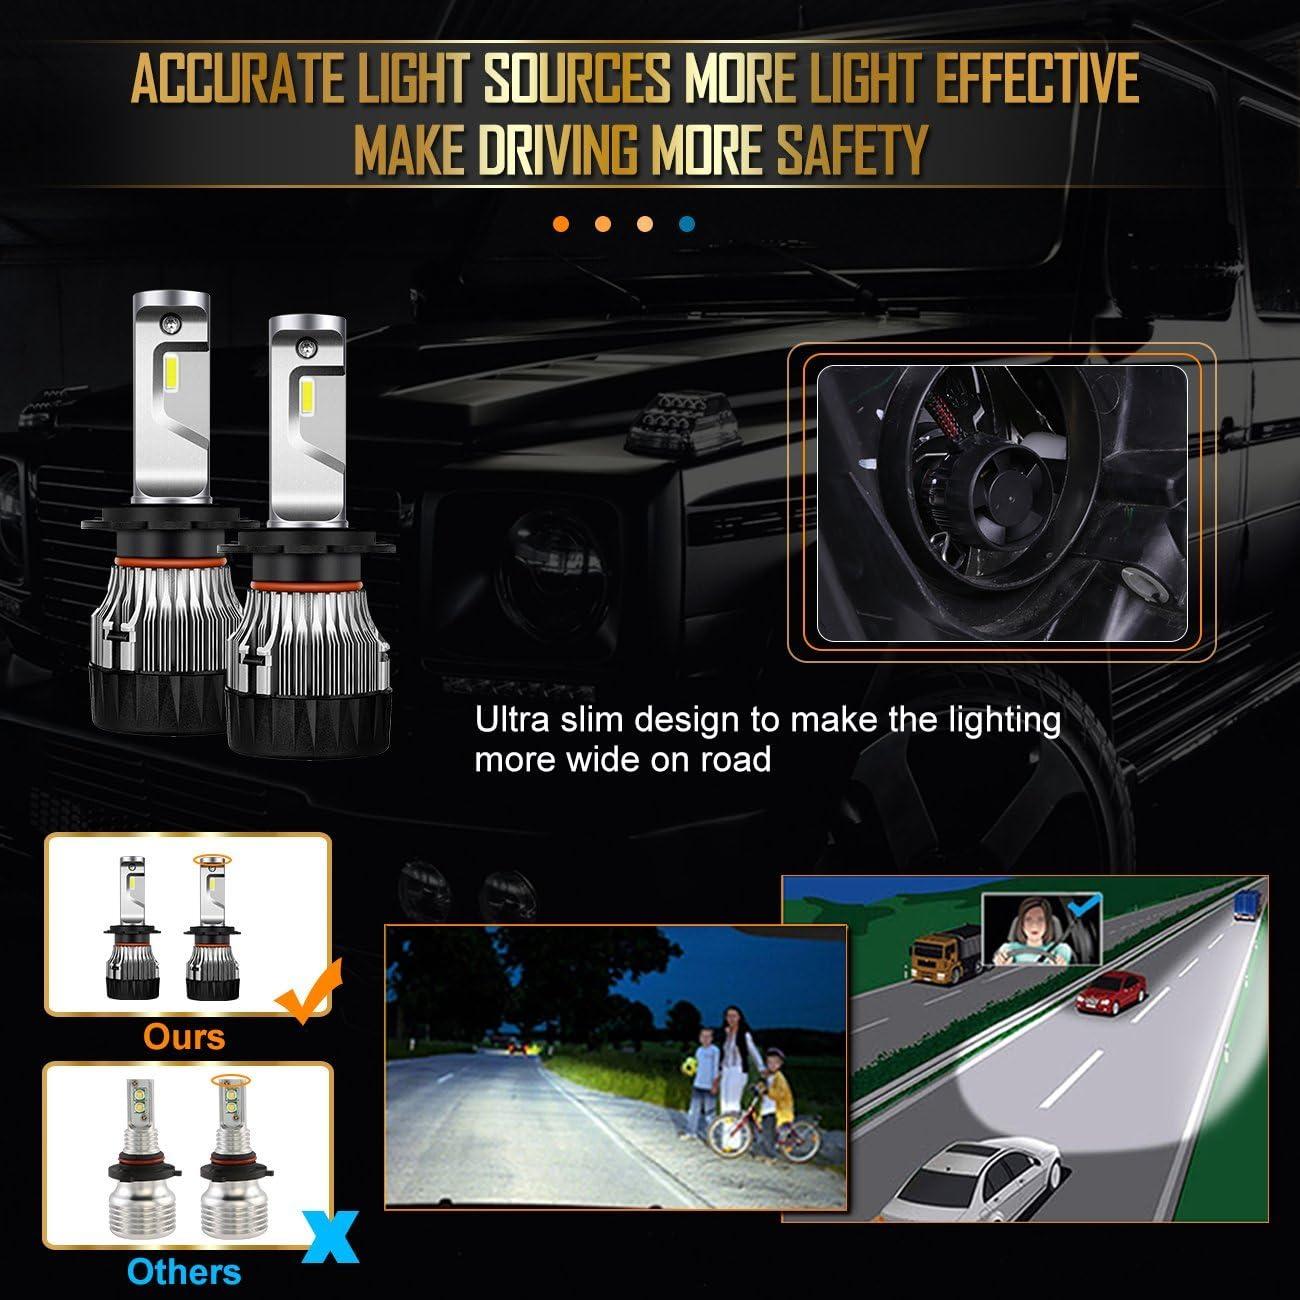 Led Headlight Bulbs,Rigidhorse H7 Mini Led Headlights 6500K 6600LM Conversion Kit,High/&Low Beam Fog Driving Lights 3 Years Warranty